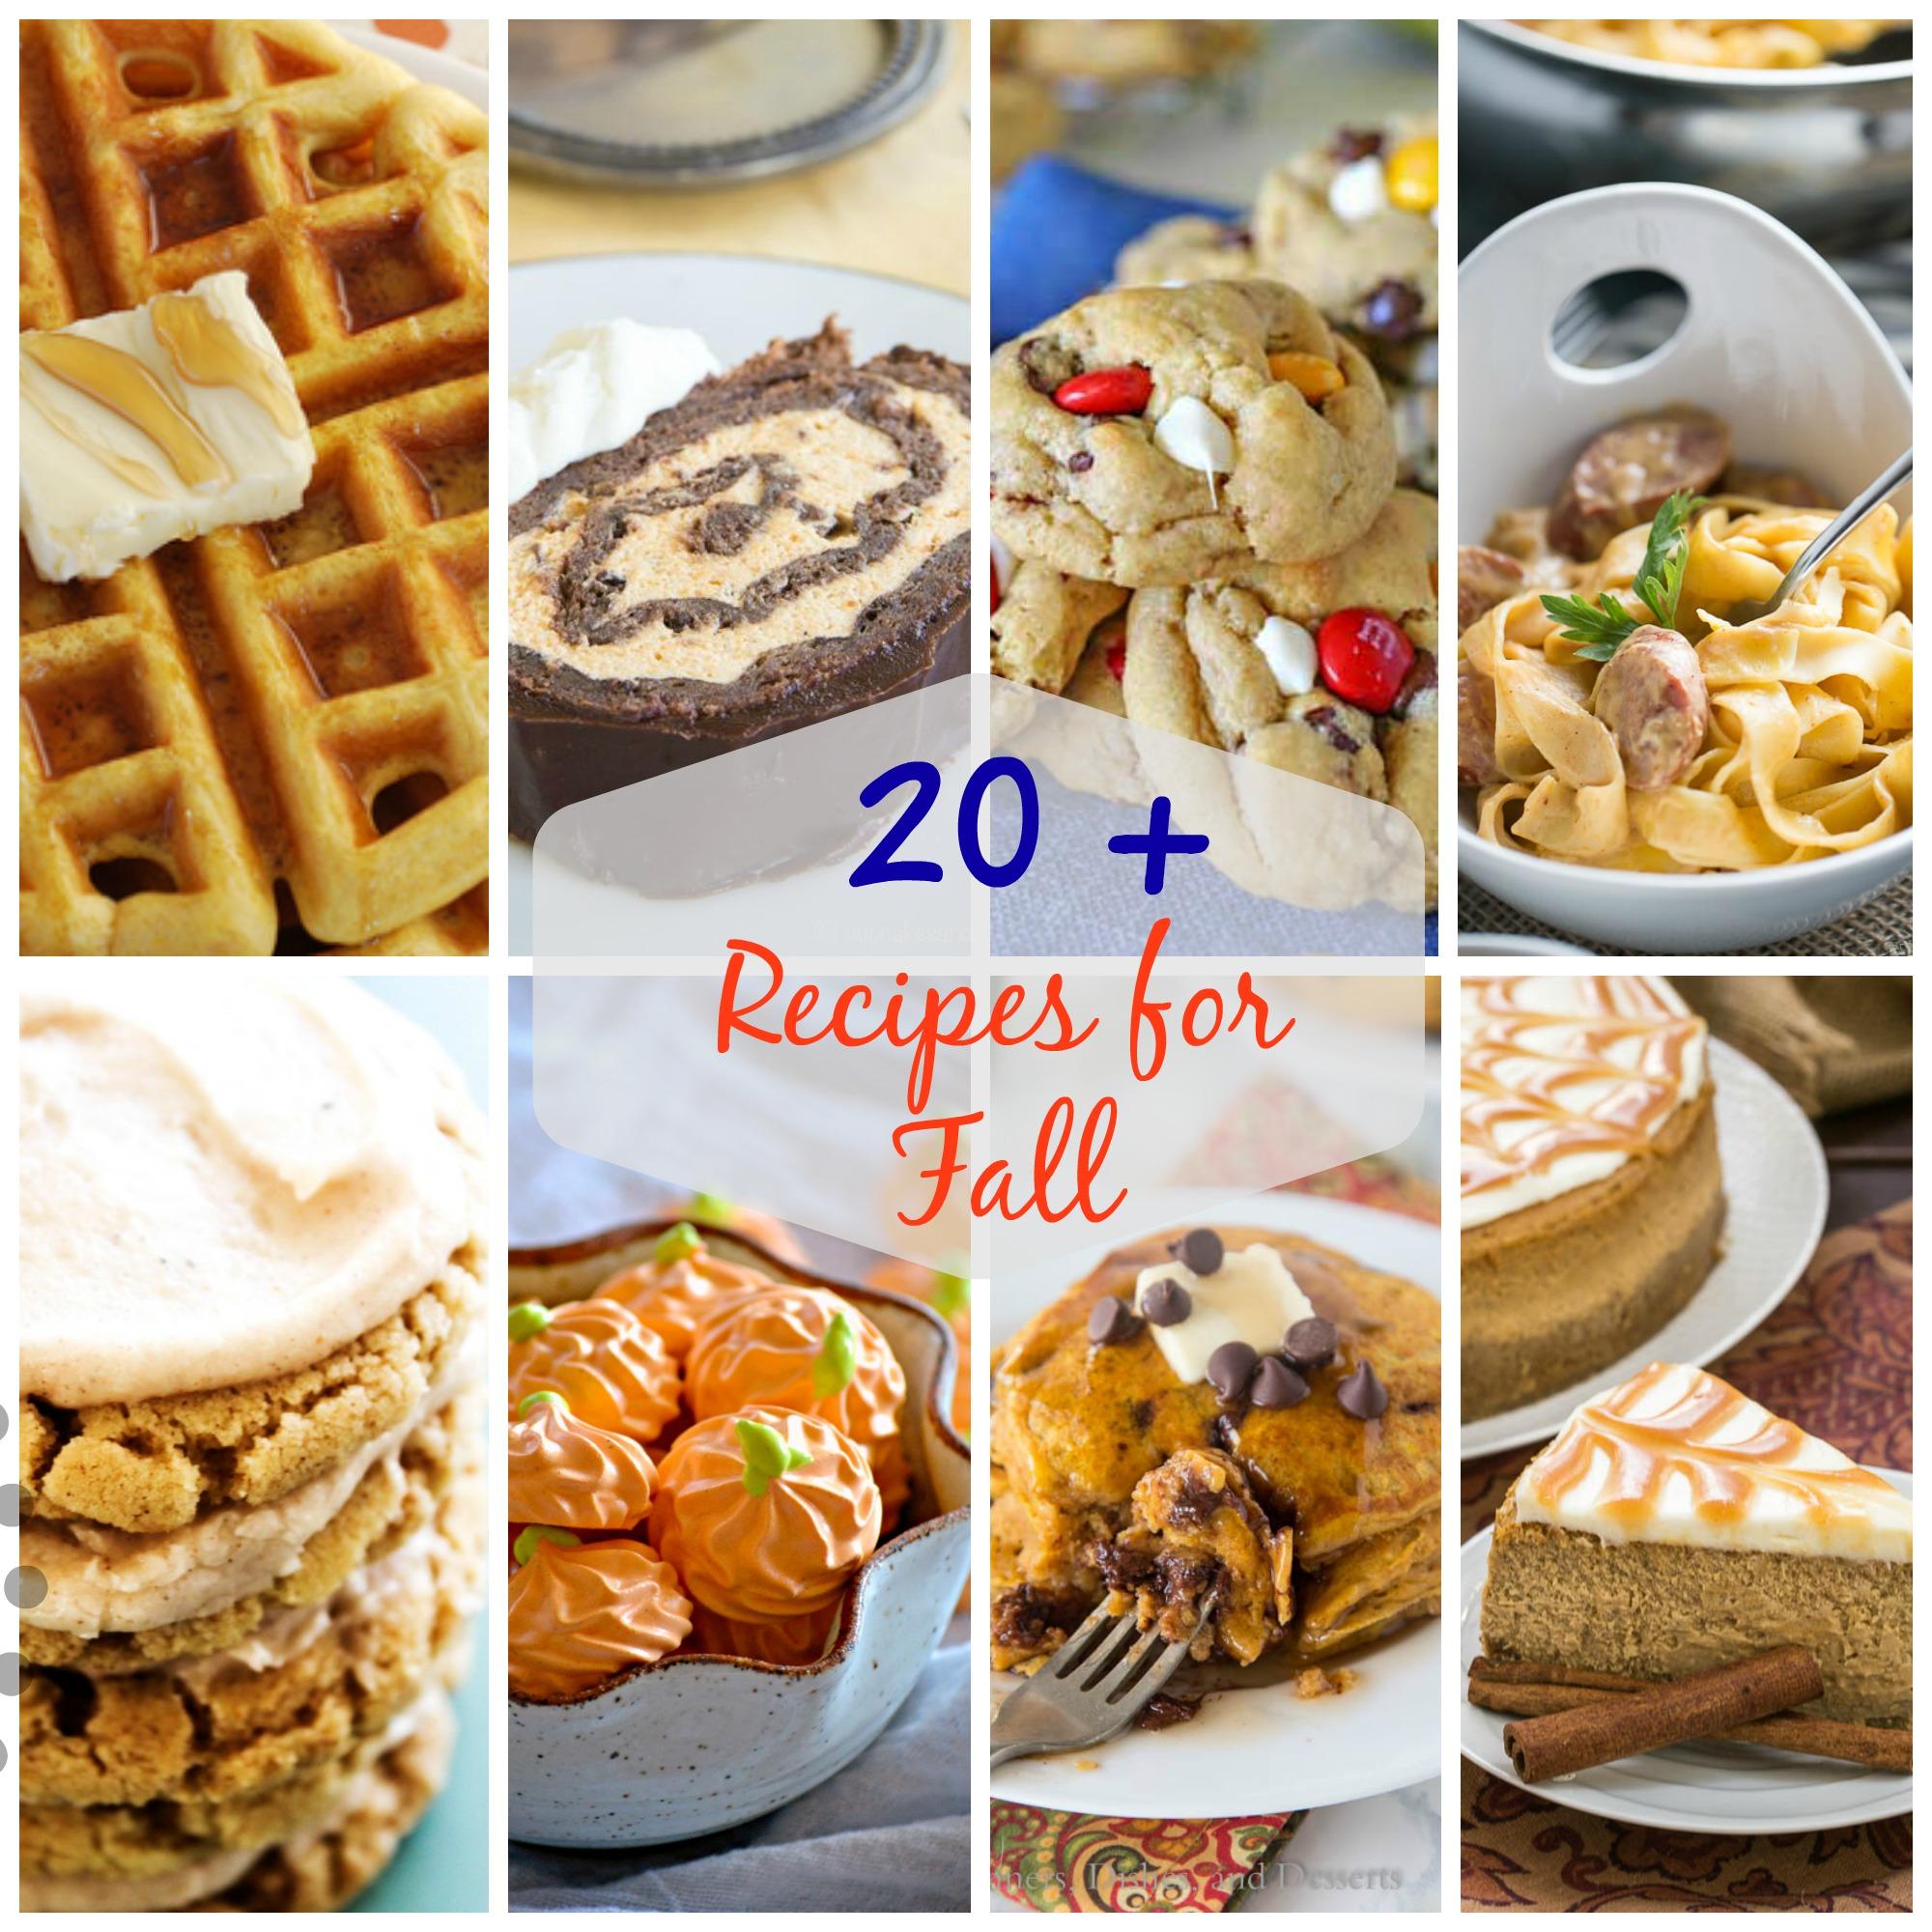 20+ Perfect Fall Recipes